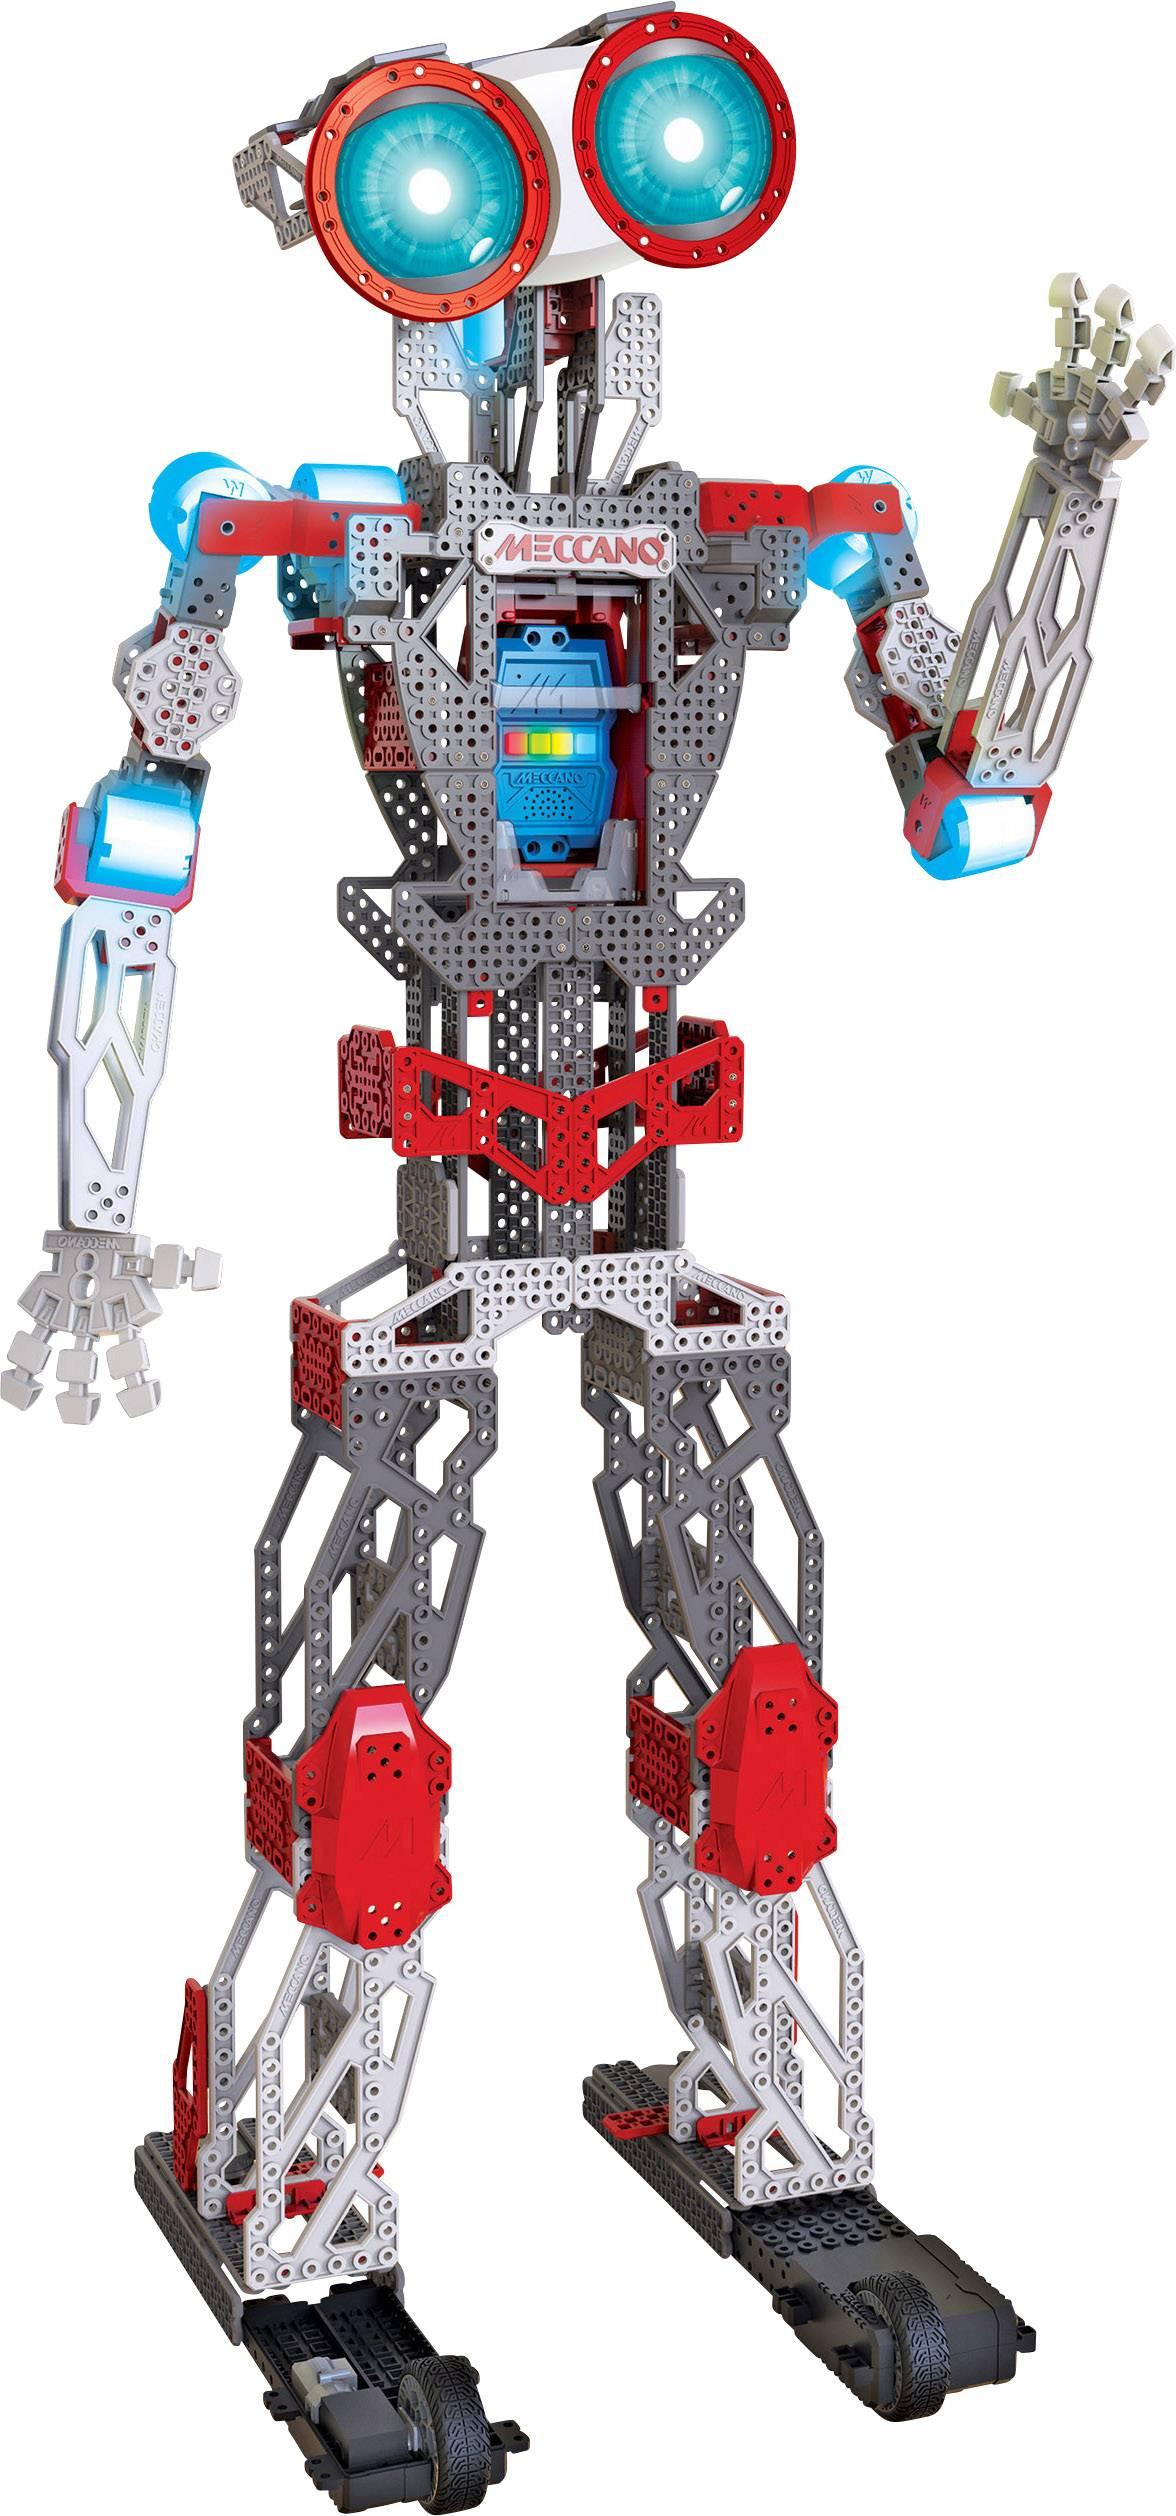 Hračka robota Meccano Tech Meccanoid XL 2.0 (GS16 KS), 122 cm